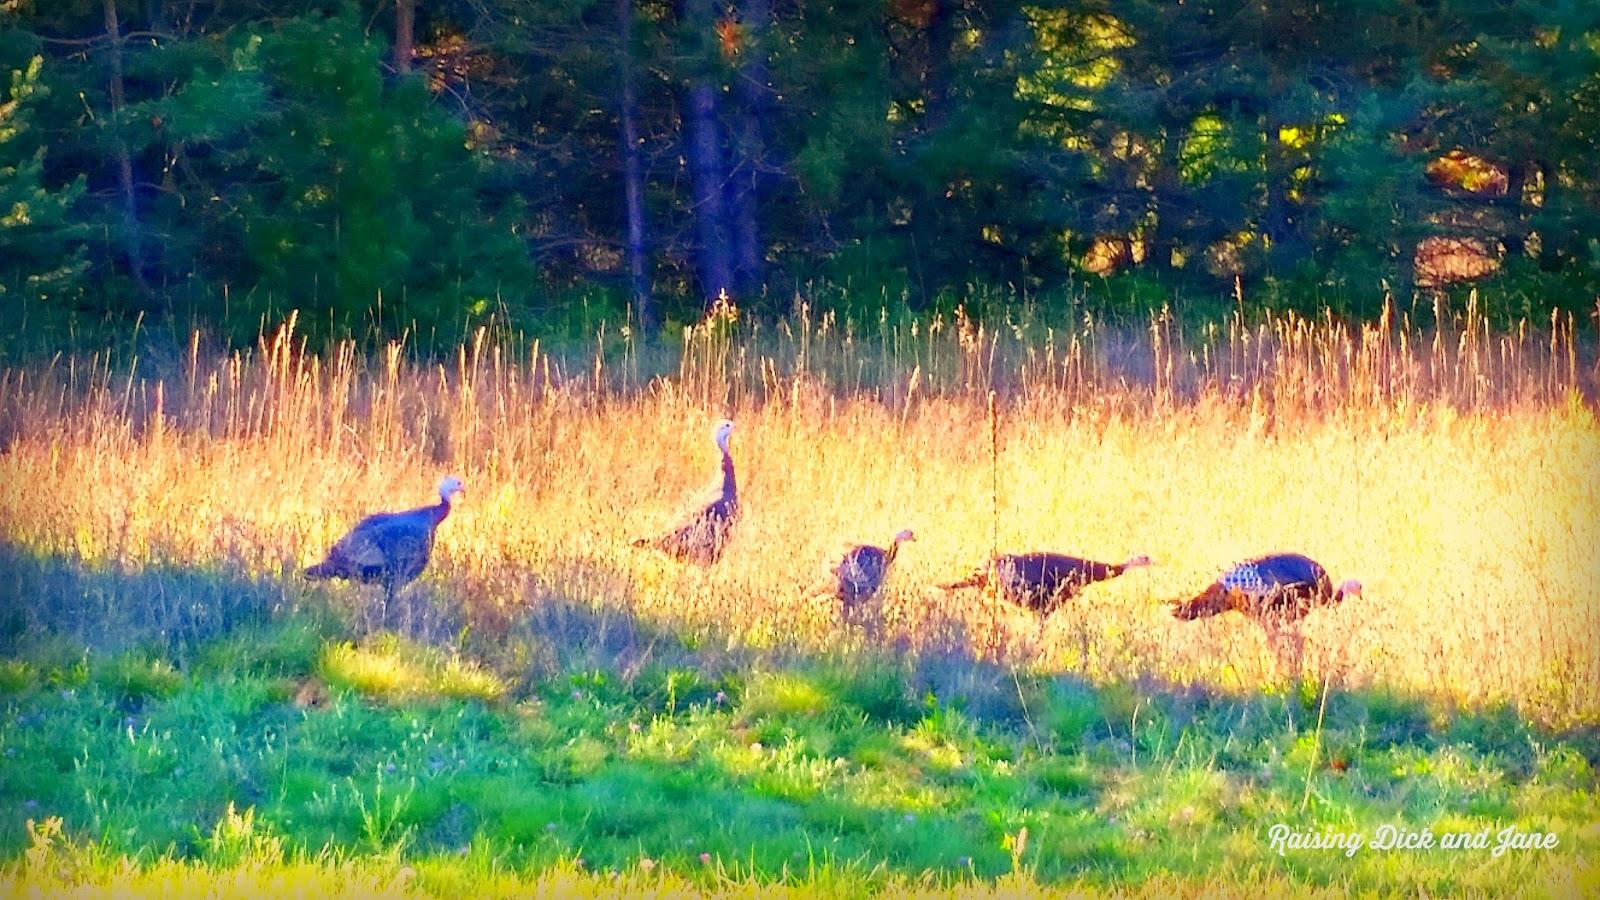 Wild Turkeys in Boyne Falls, MI #Michigan #travelblogger